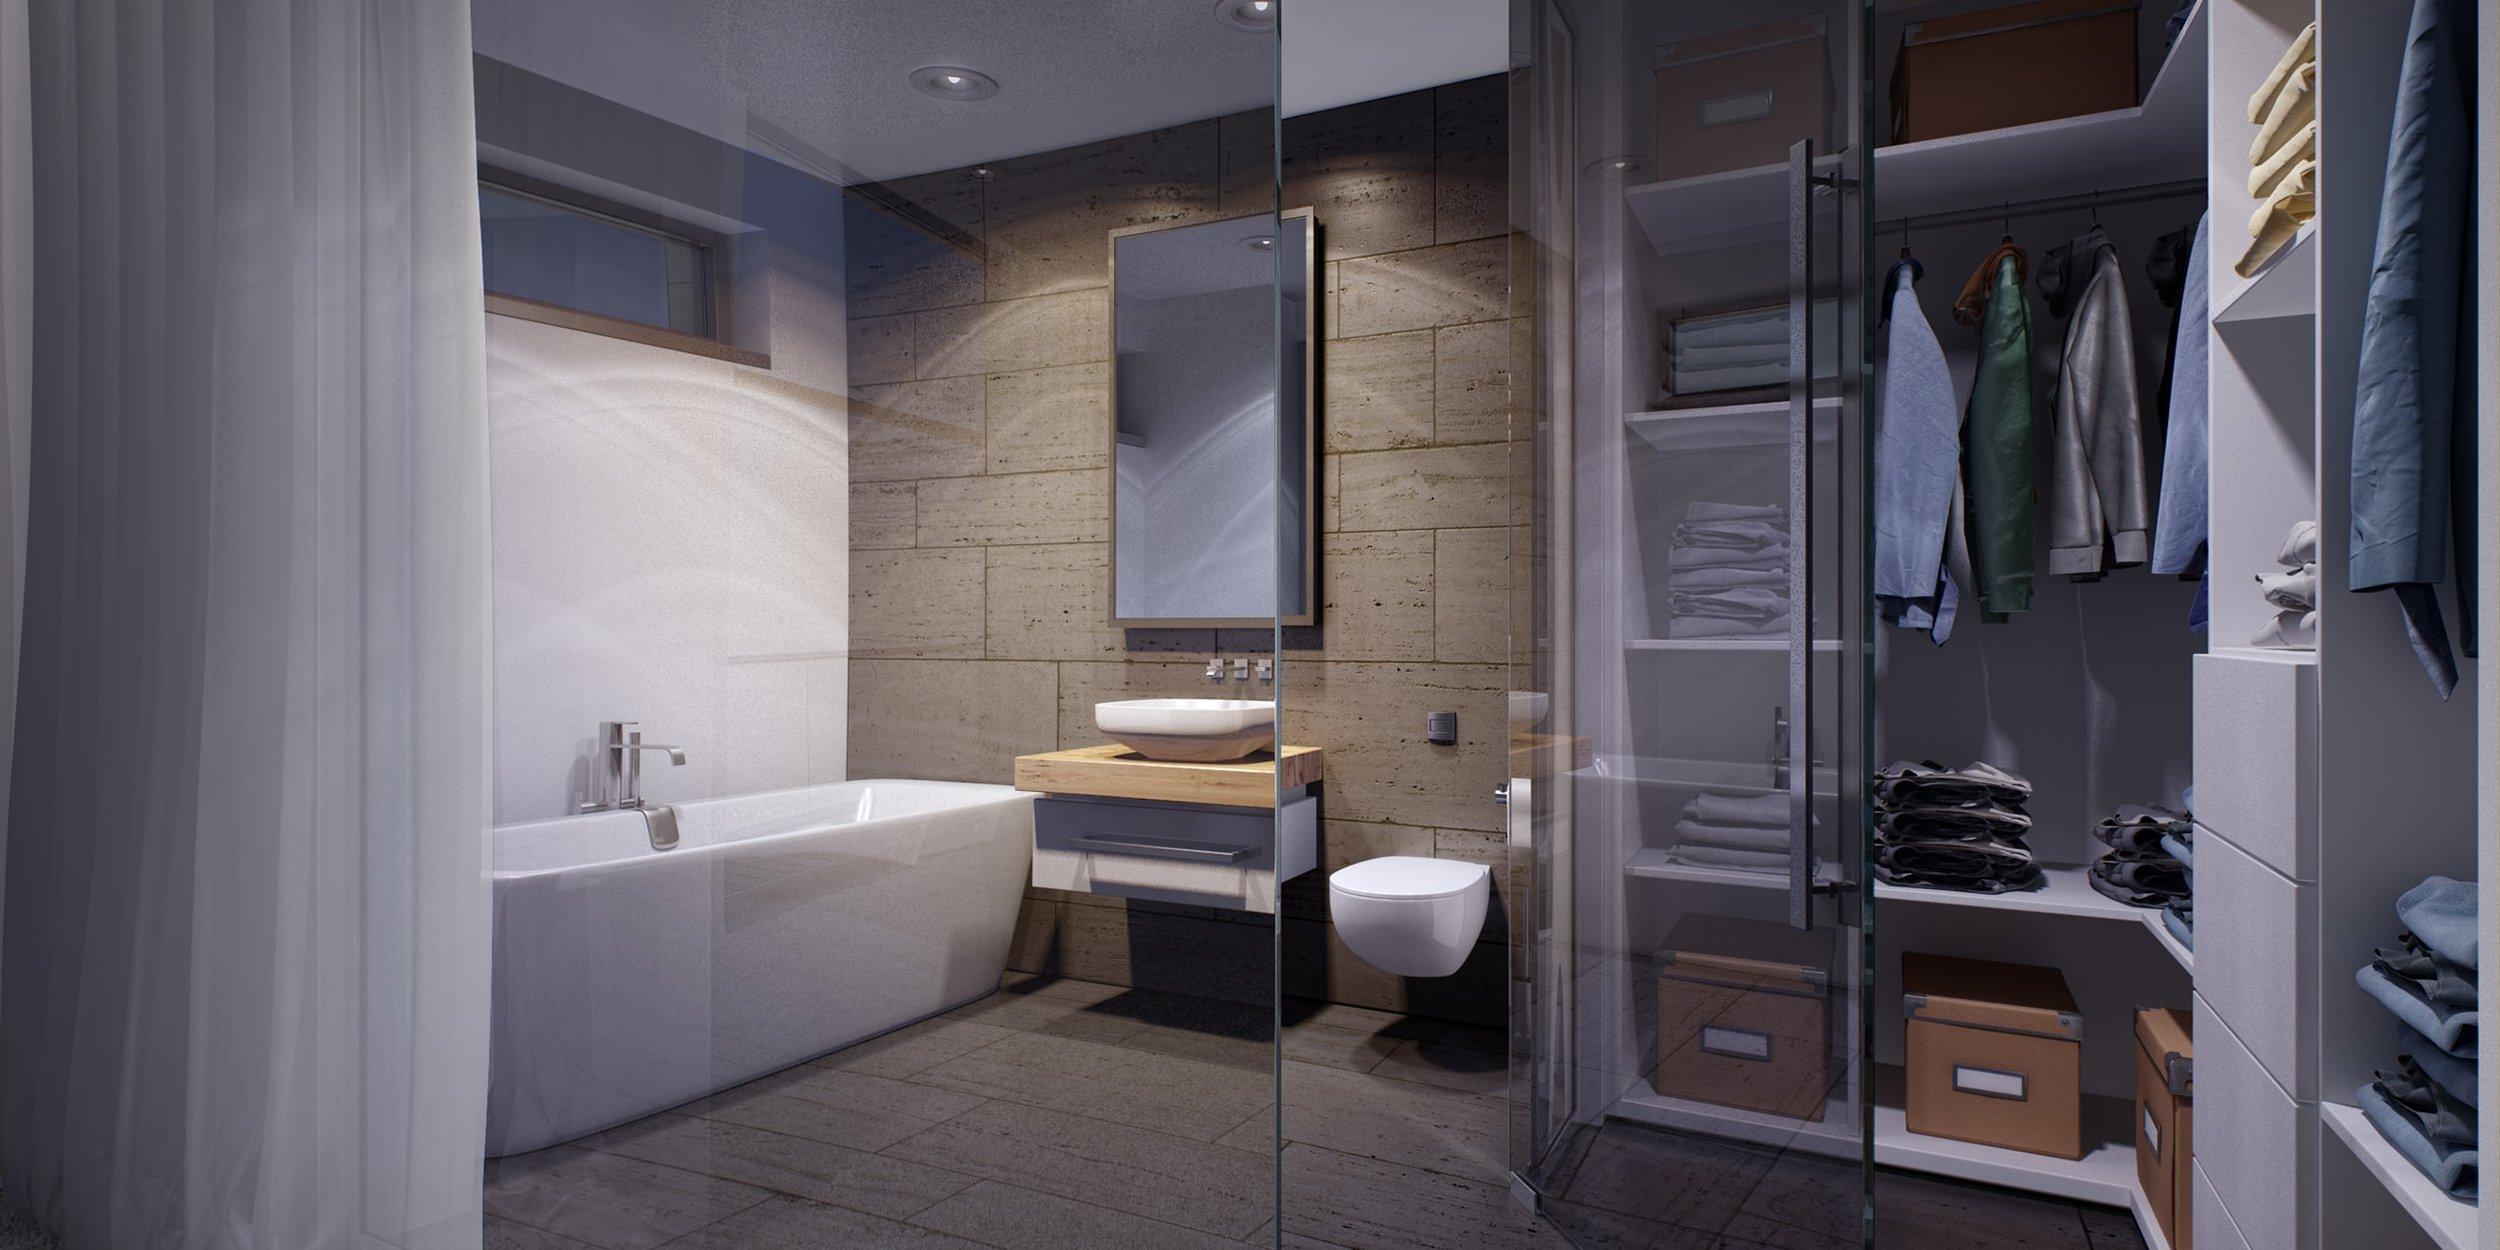 RR_Bathroom-min.jpg